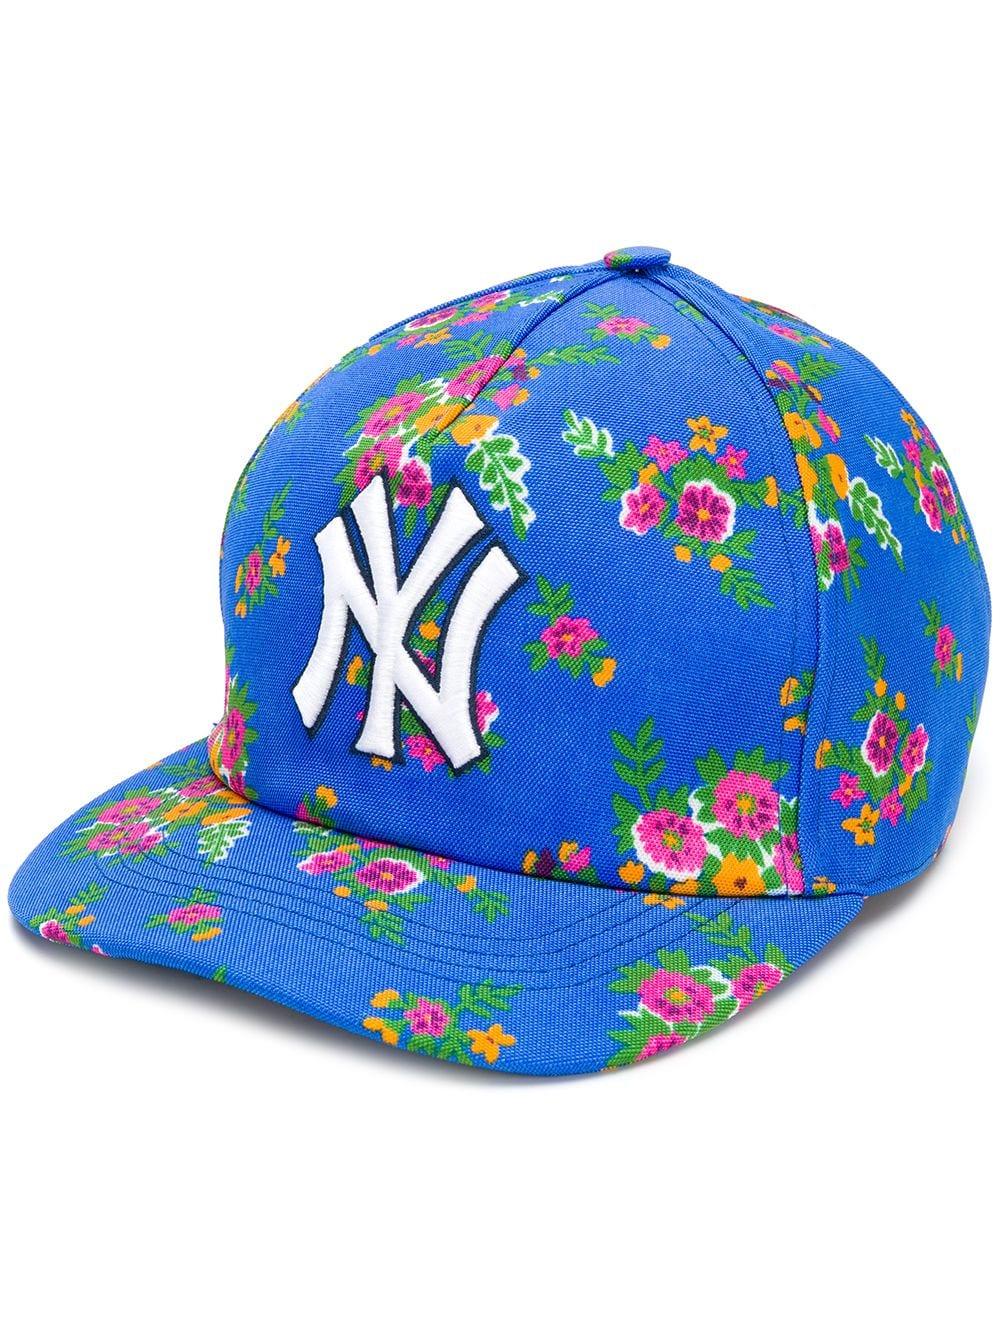 Gucci Ny Yankees Baseball Cap Farfetch Baseball Cap Gucci Yankees Baseball Cap